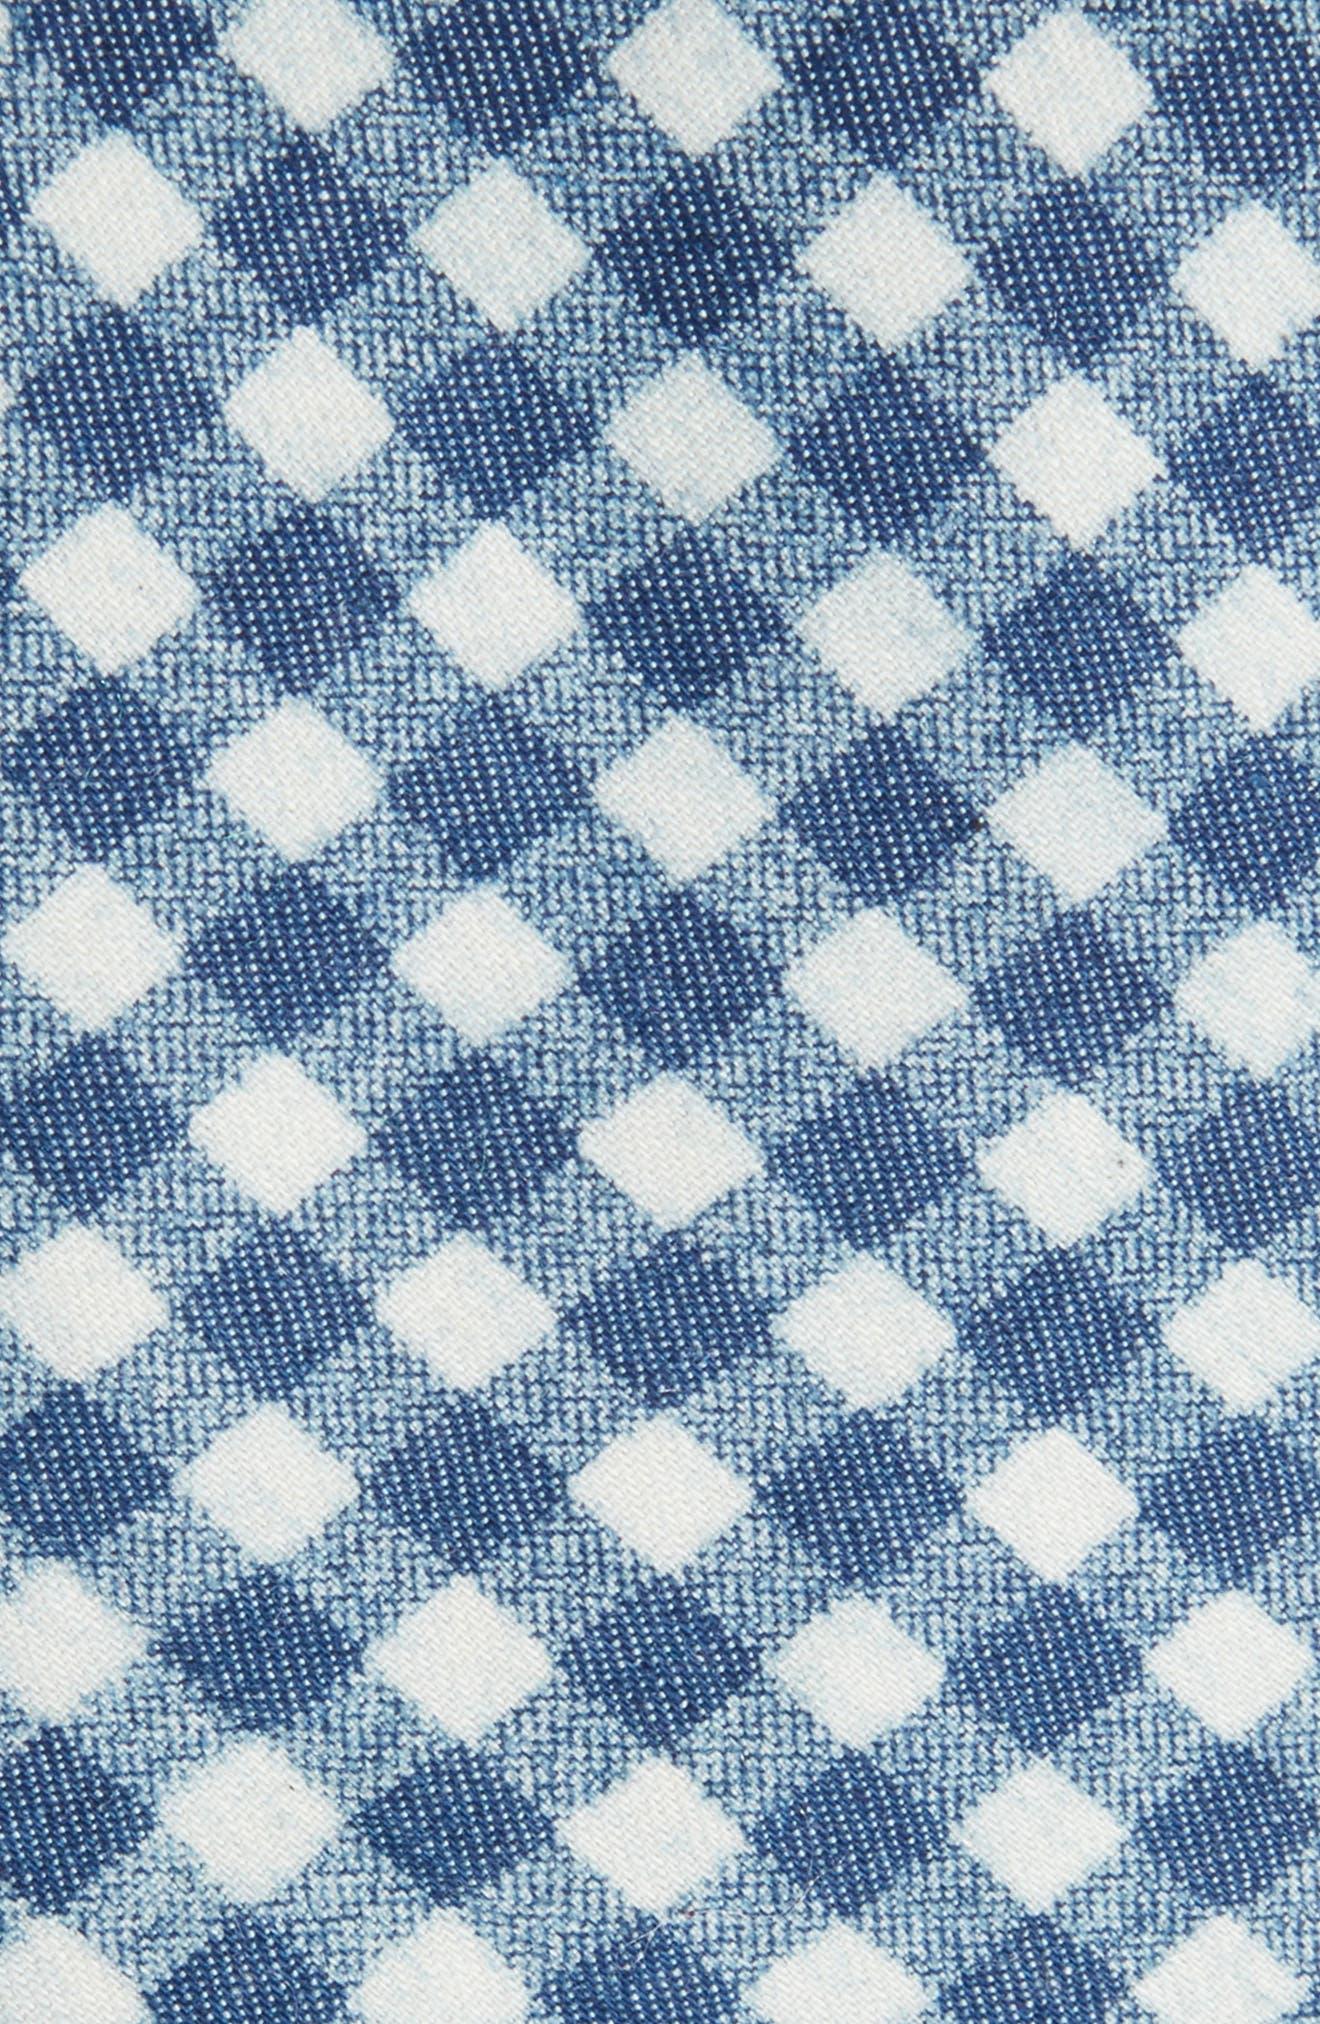 Freeman Check Cotton Skinny Tie,                             Alternate thumbnail 2, color,                             410